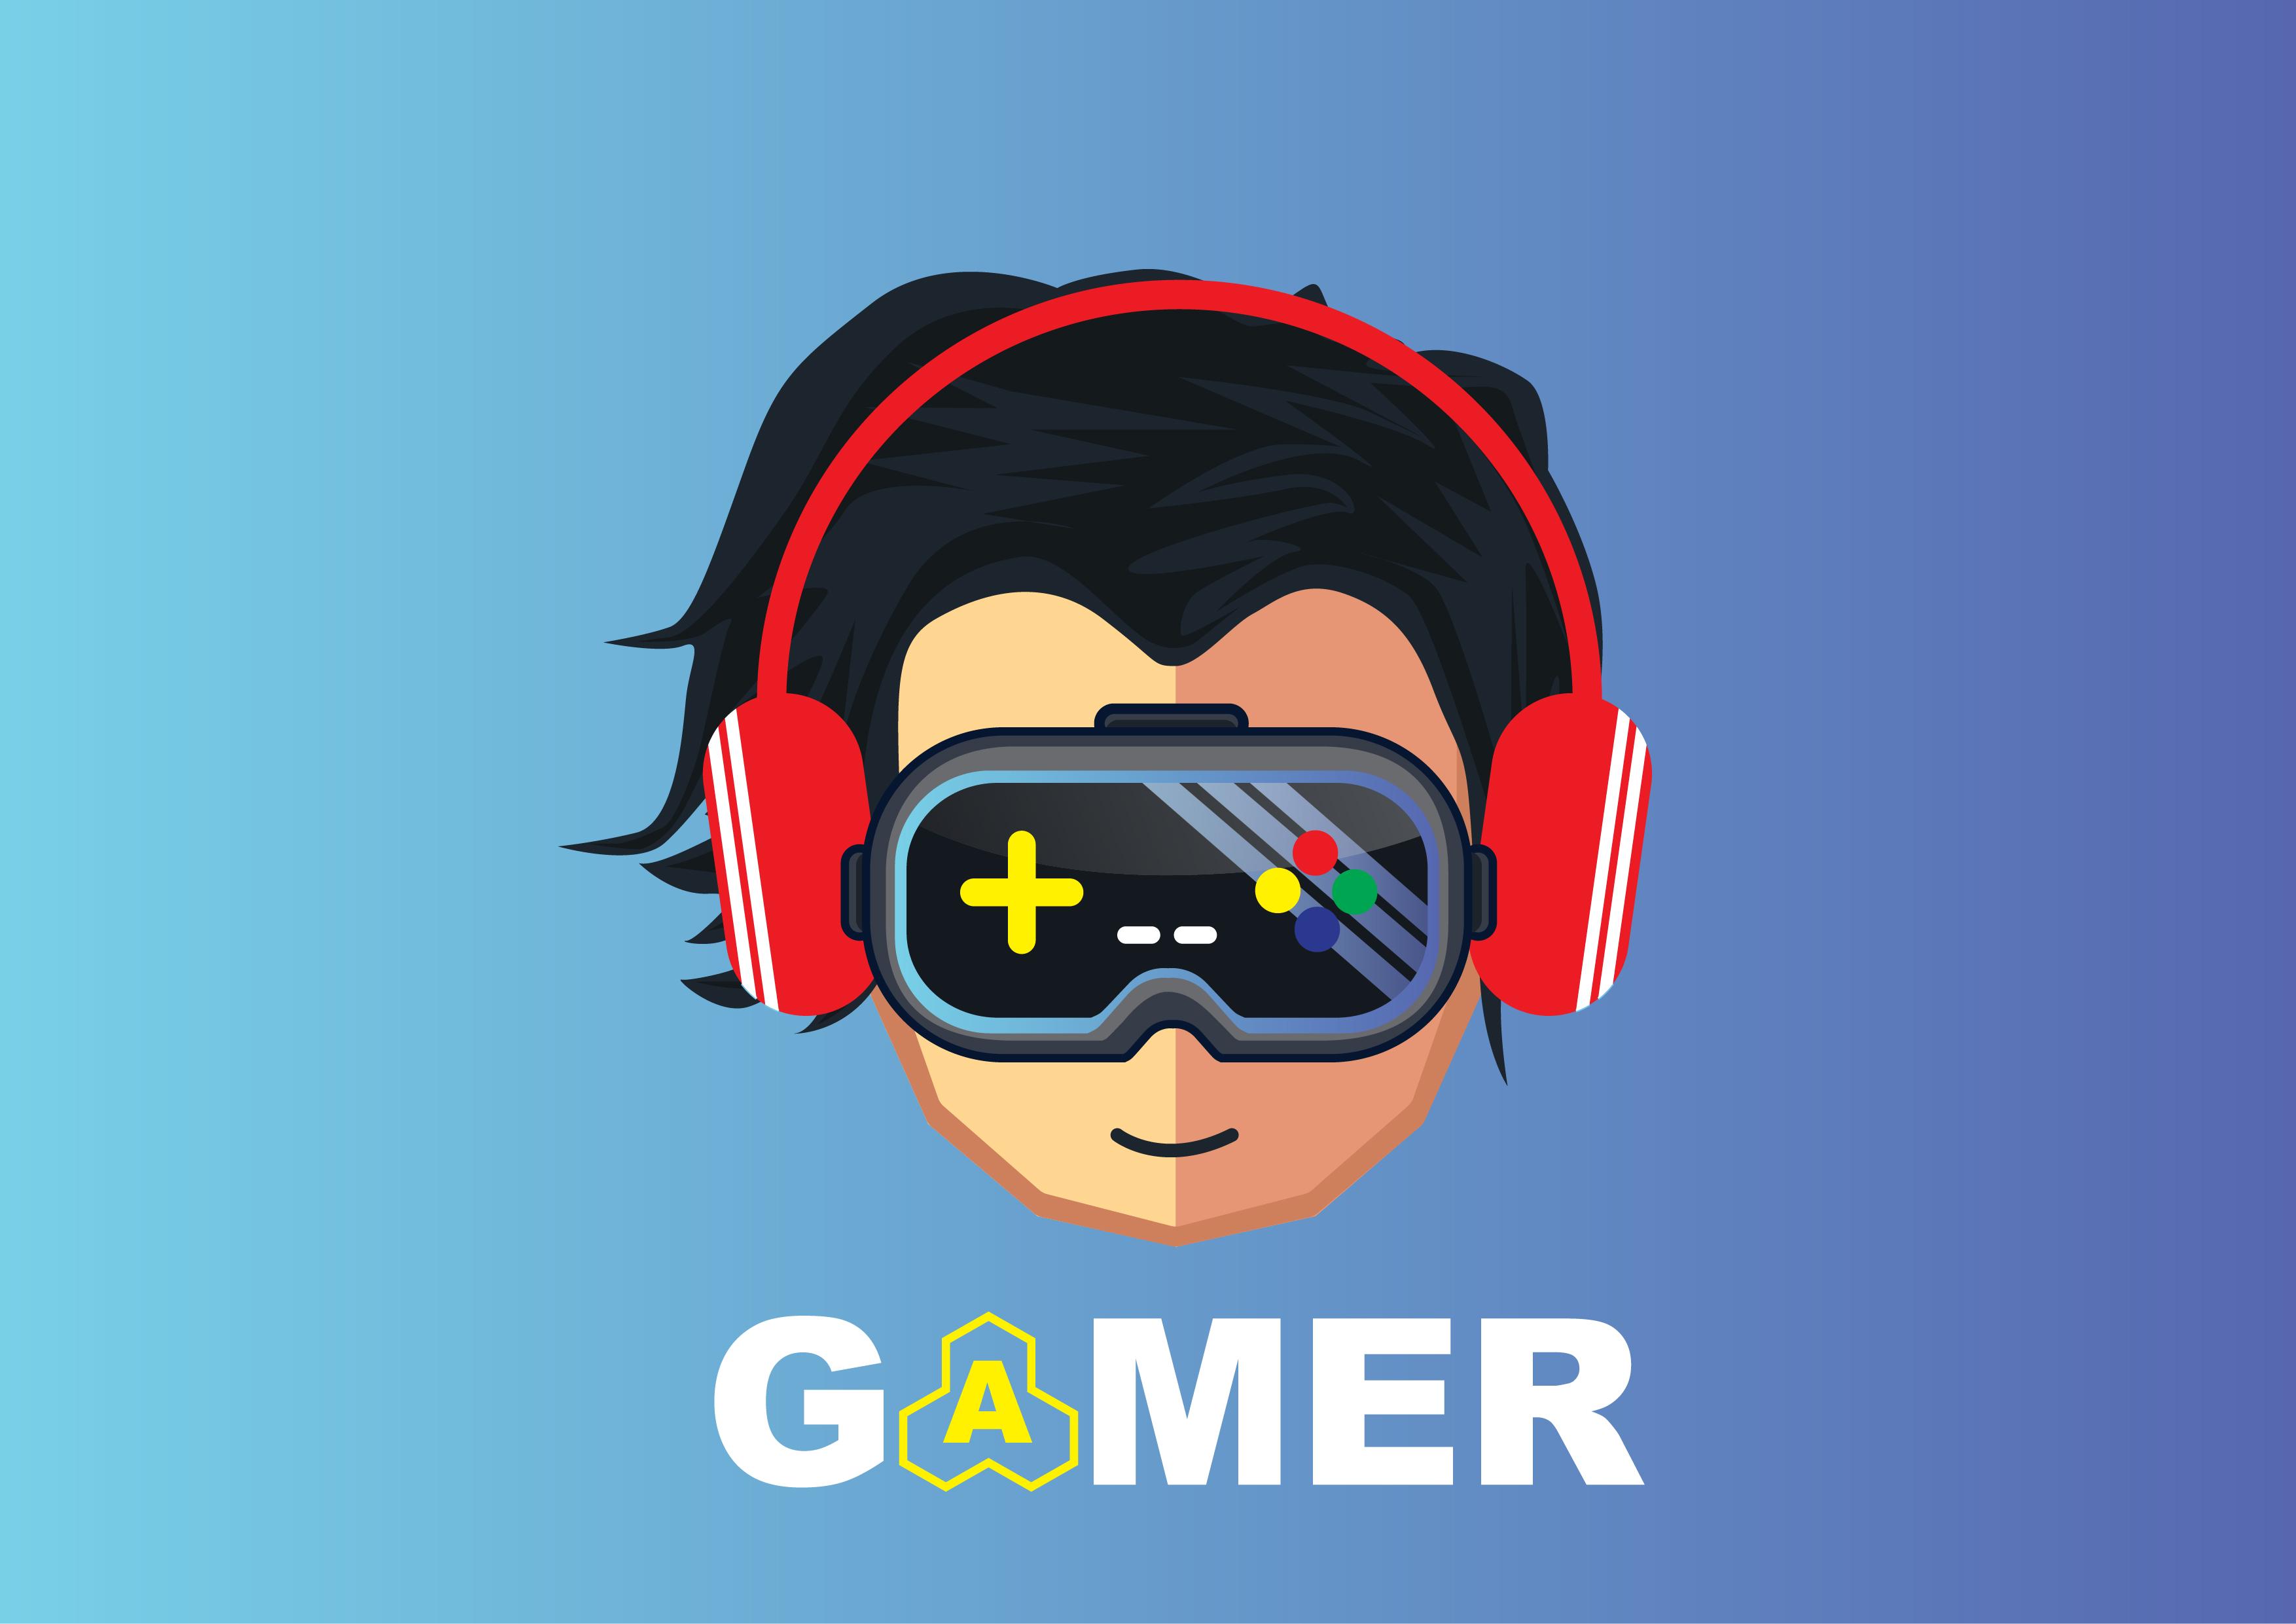 gamer icon character design cartoon